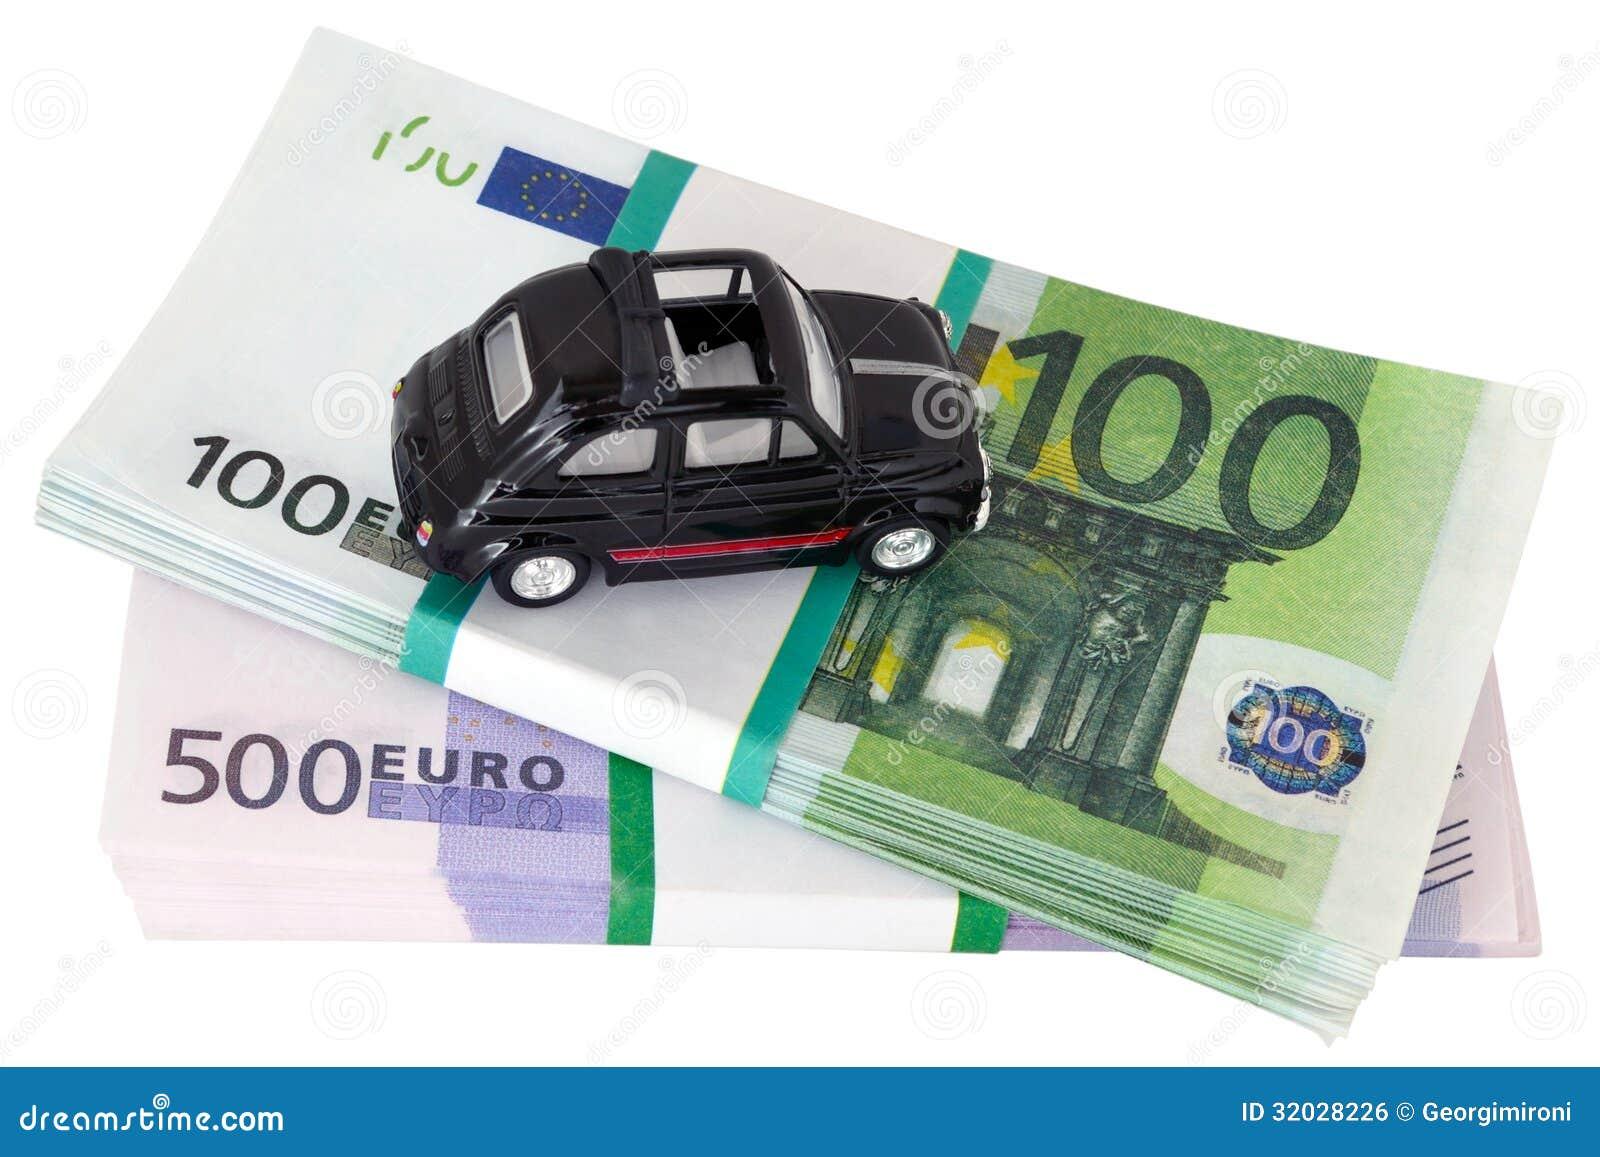 Making Money Selling Car Insurance